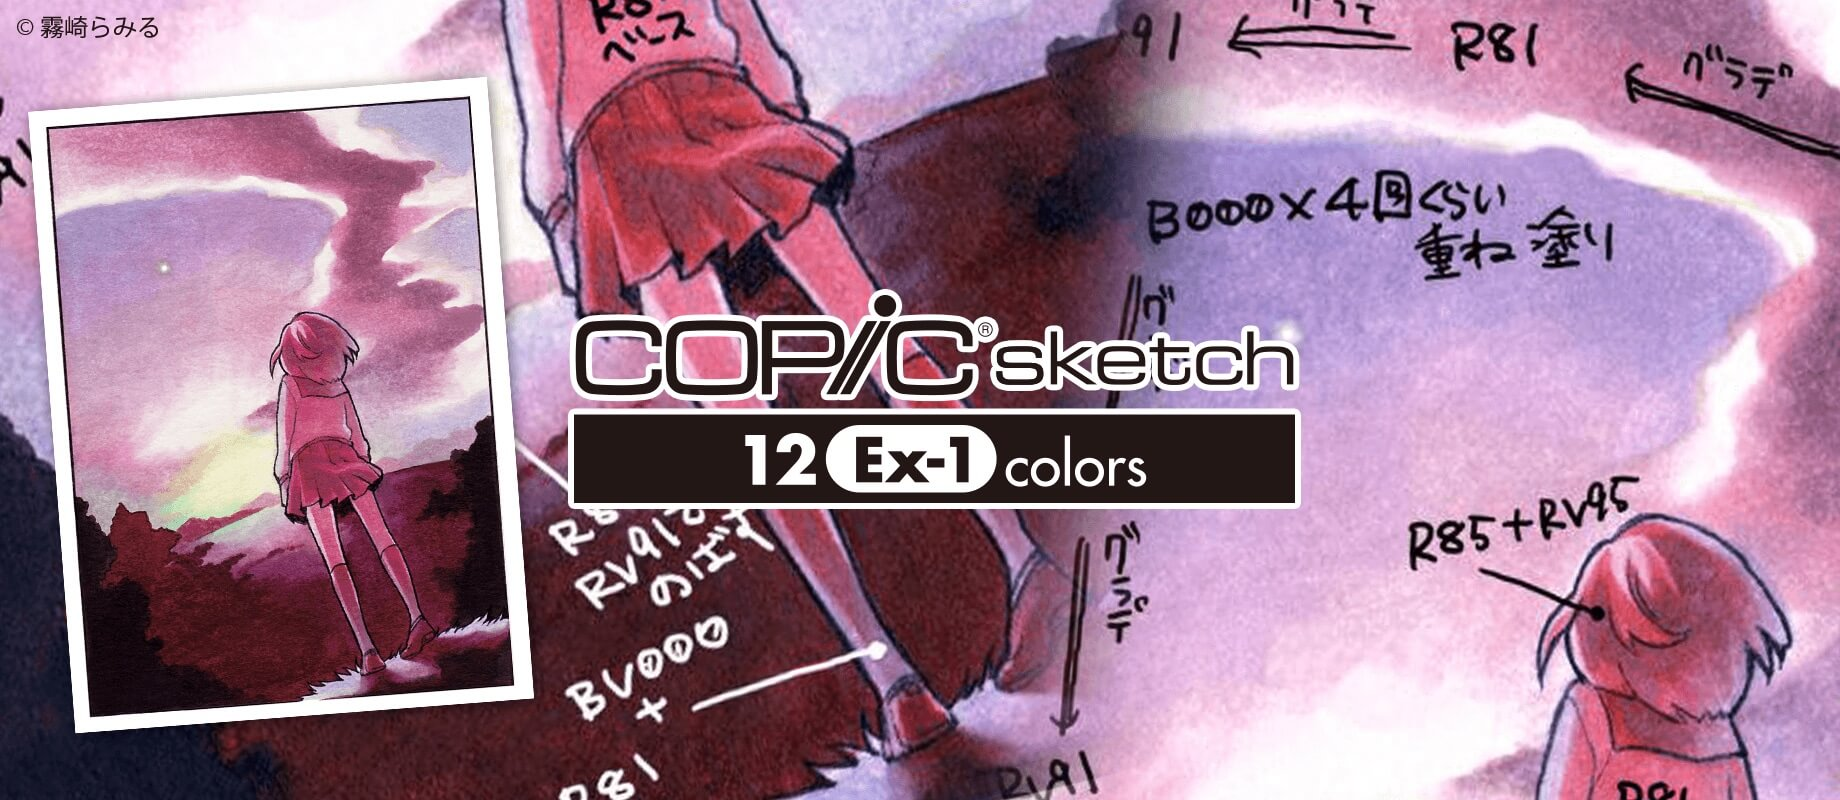 sketchex1_title_b